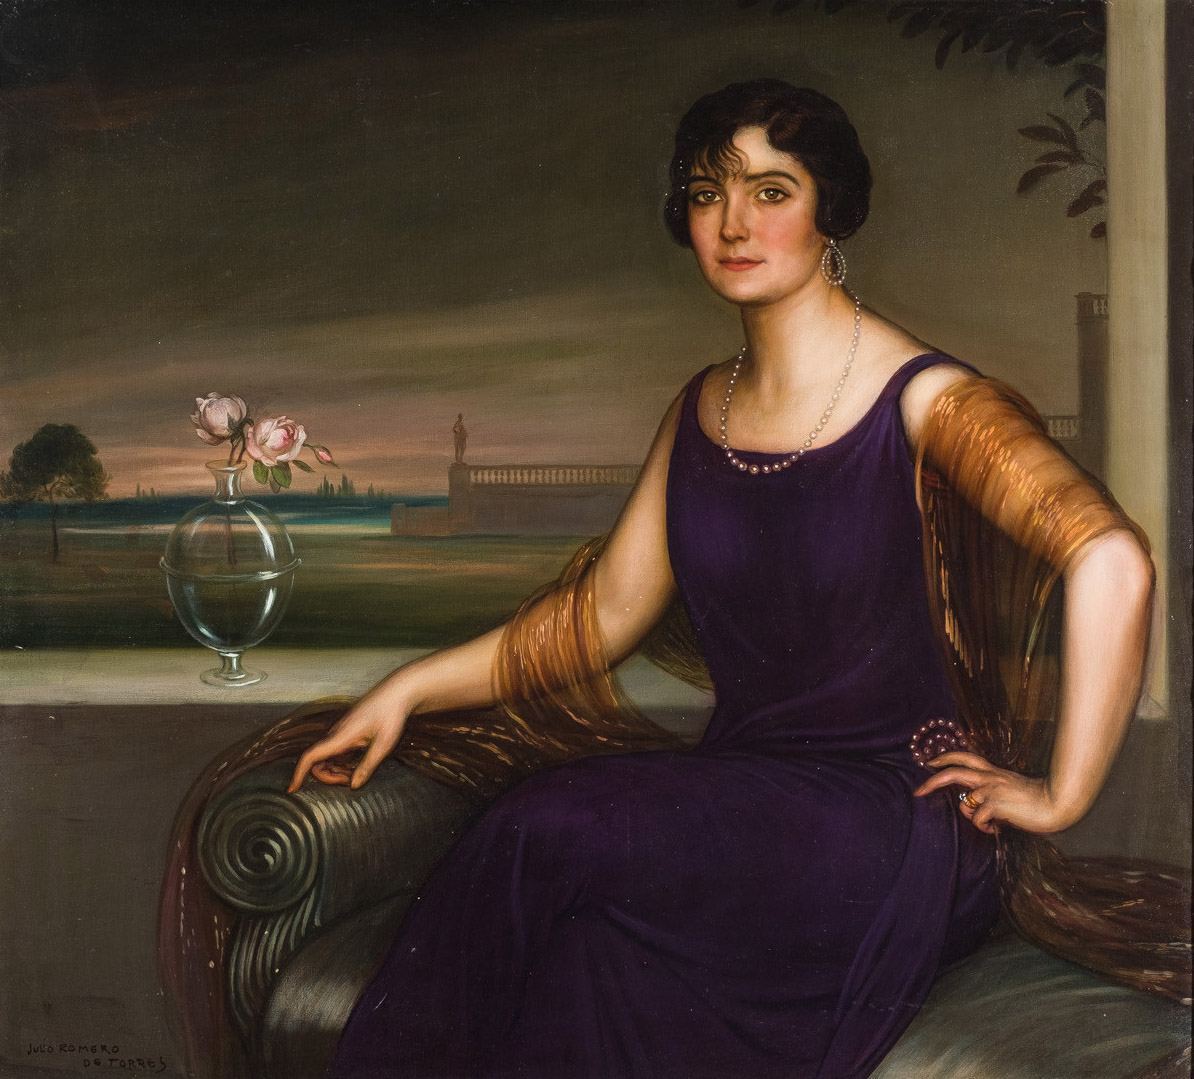 Julio Romero de Torres. Retrato de Nidia Apaolaza de Vela, 1922-1923. Salida: 180.000 euros. No vendido